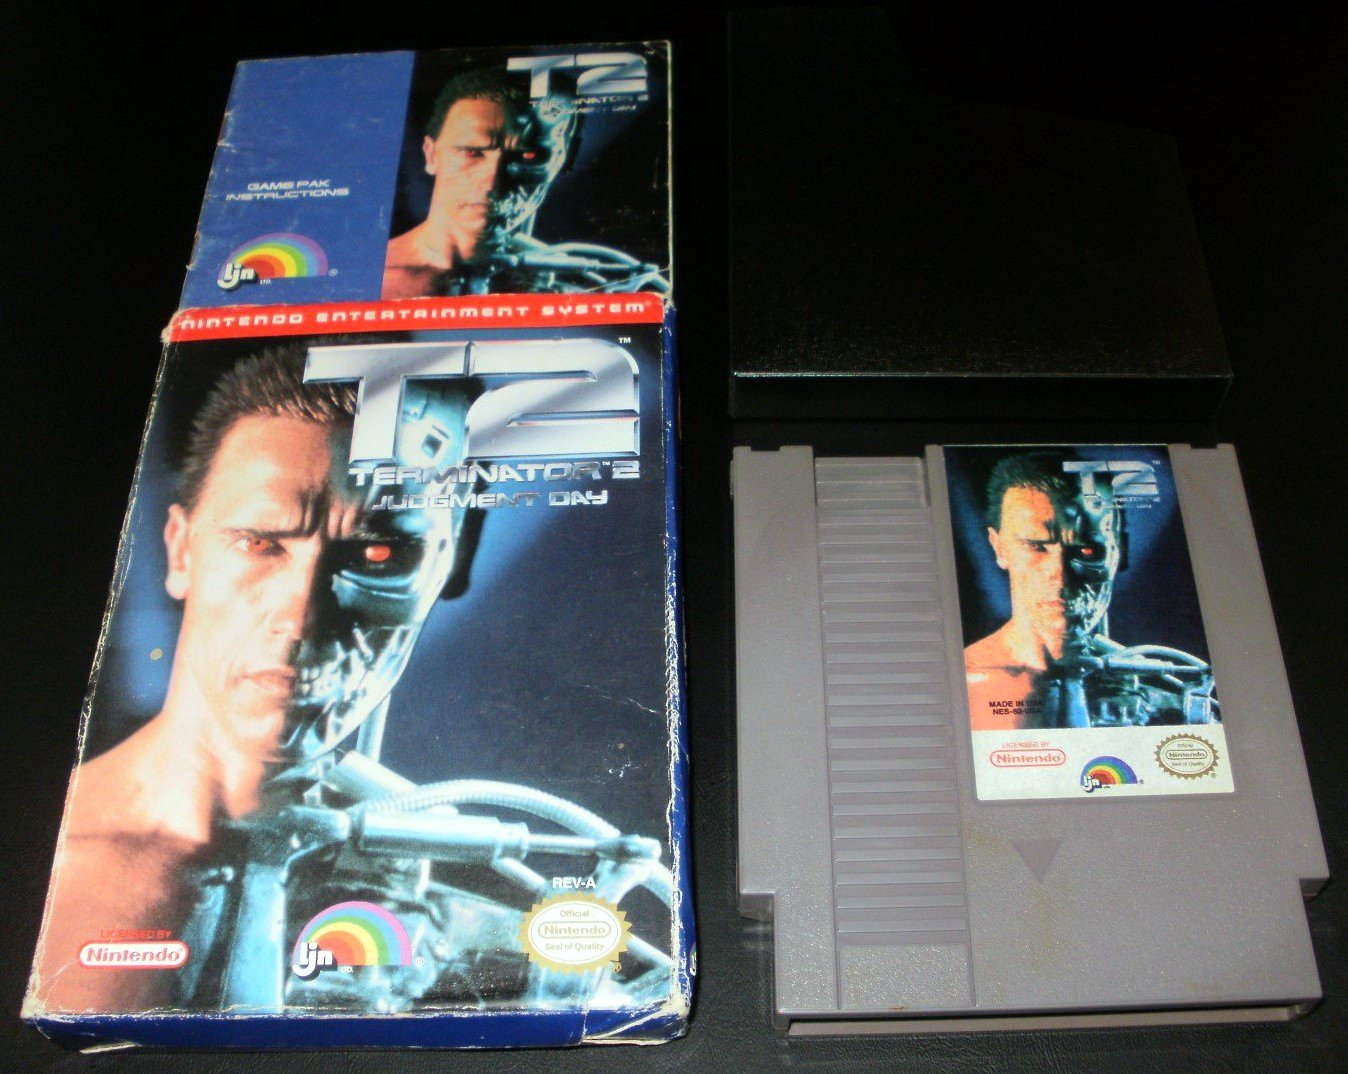 Terminator 2 Judgment Day - Nintendo NES - Complete CIB